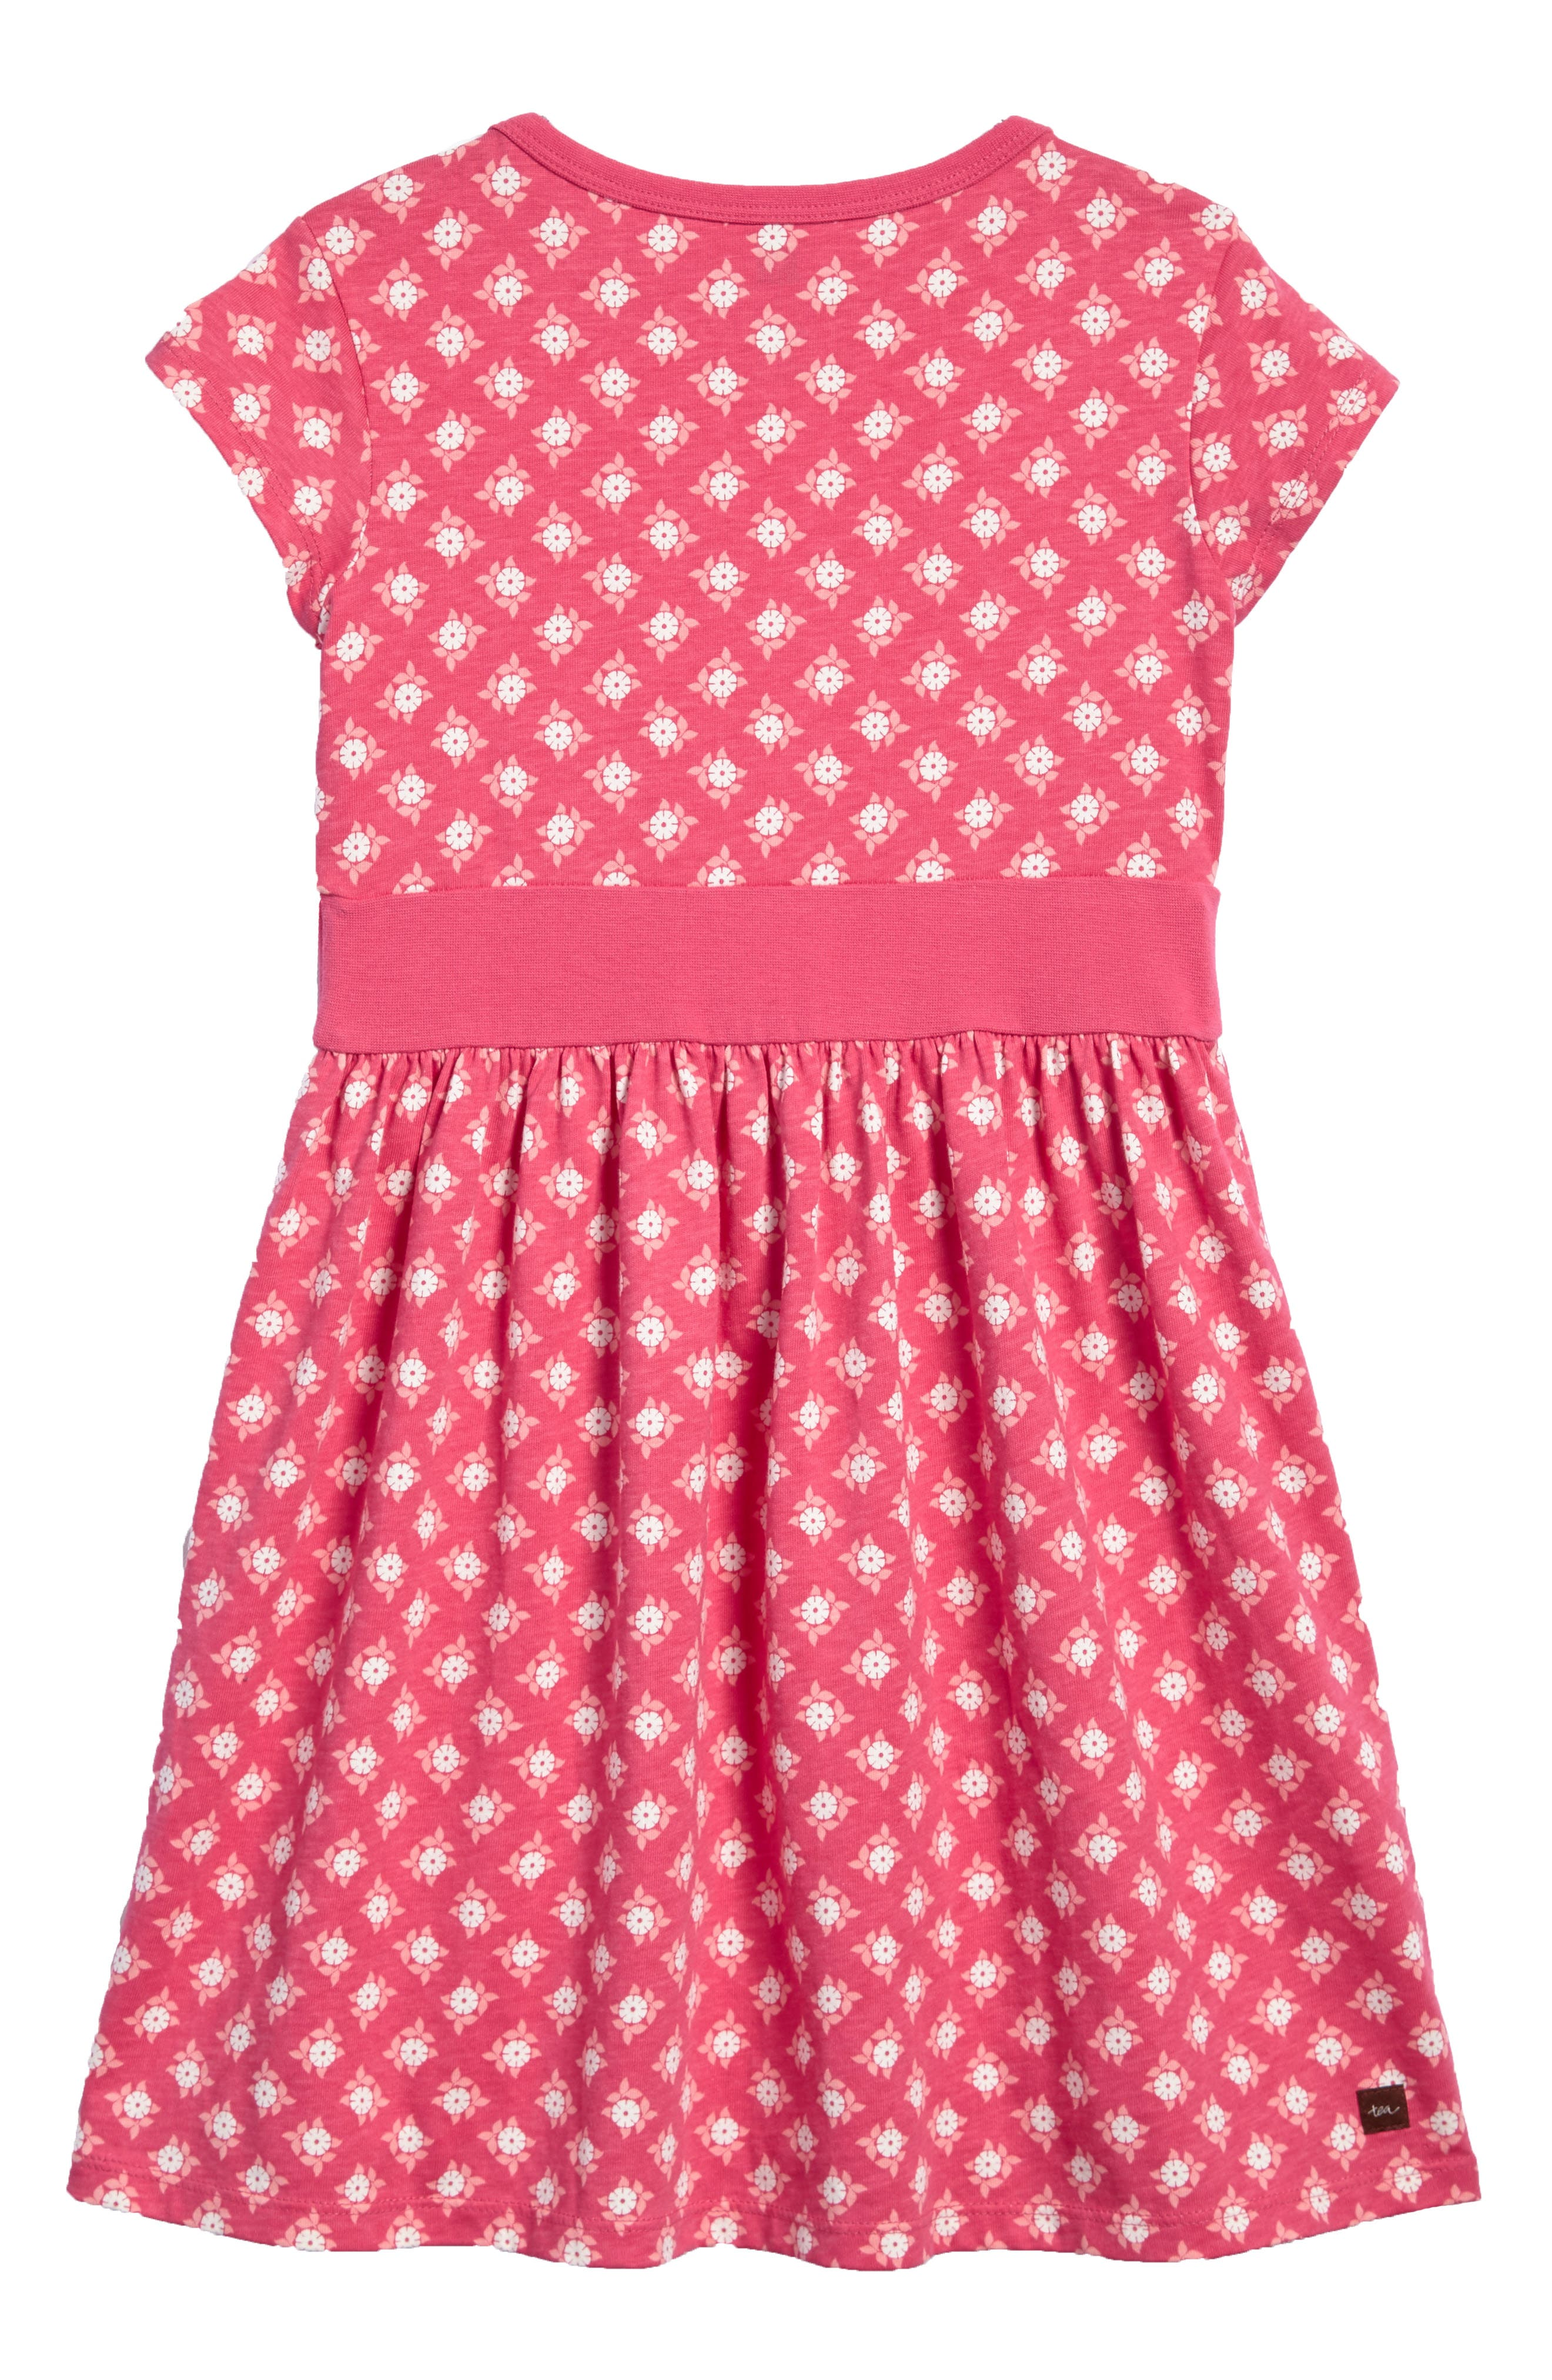 Sunburst Dress,                             Alternate thumbnail 2, color,                             650